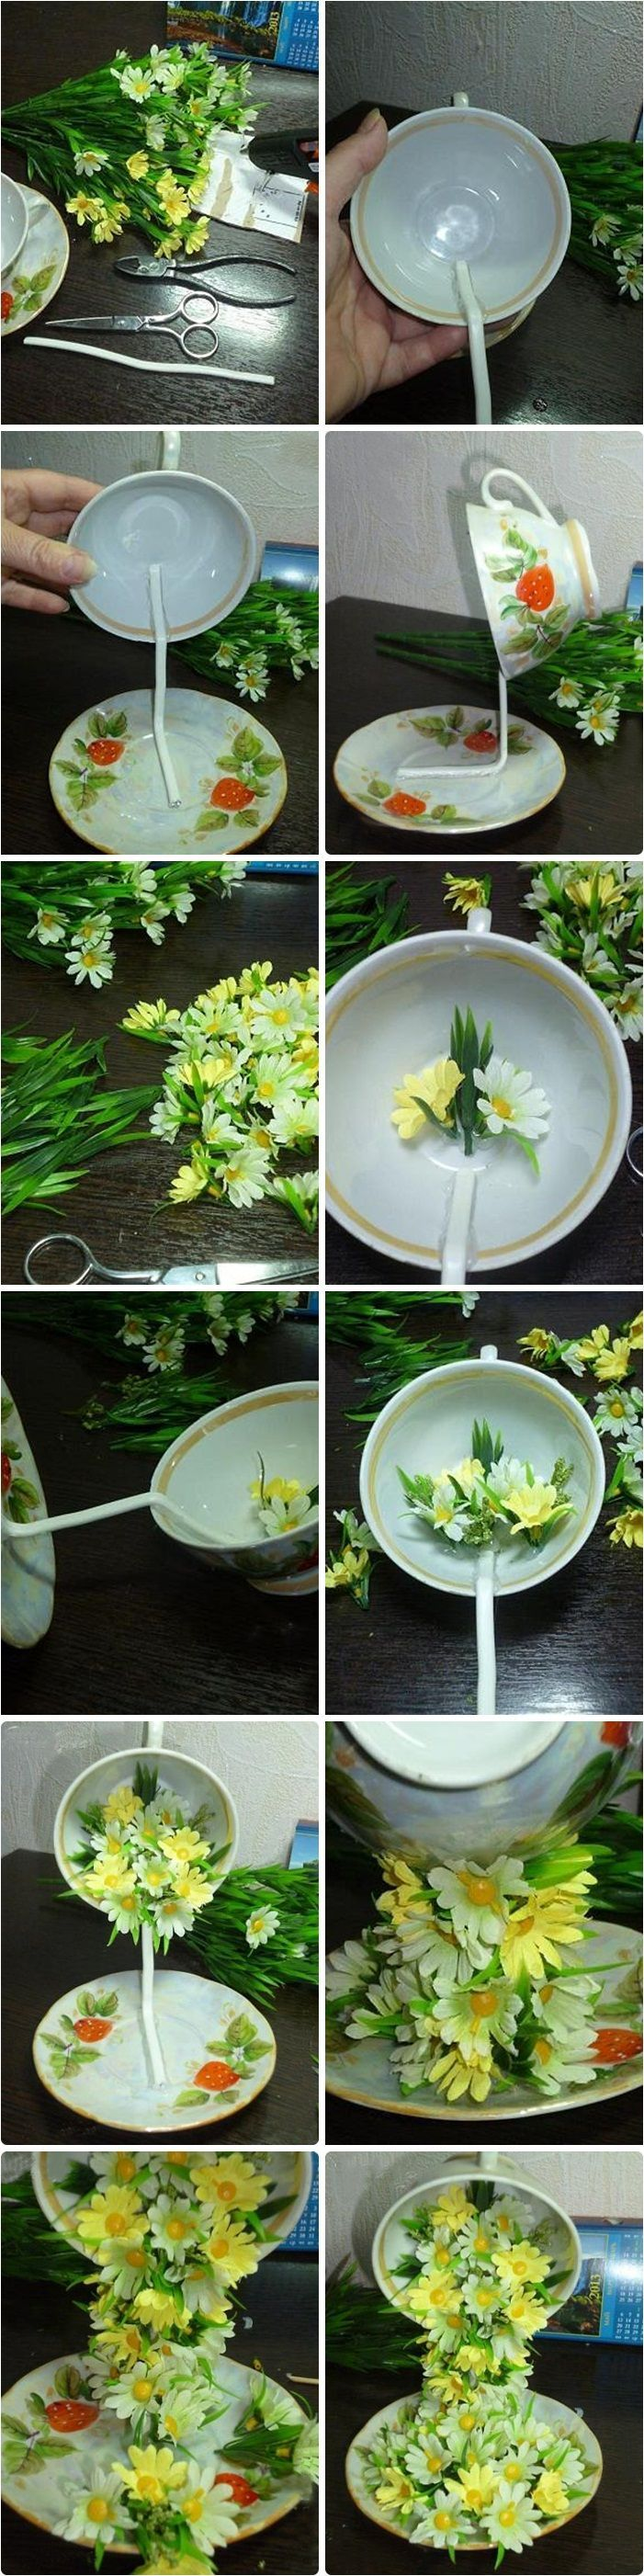 diy flower flying illusion tutorial step by step coffee cups